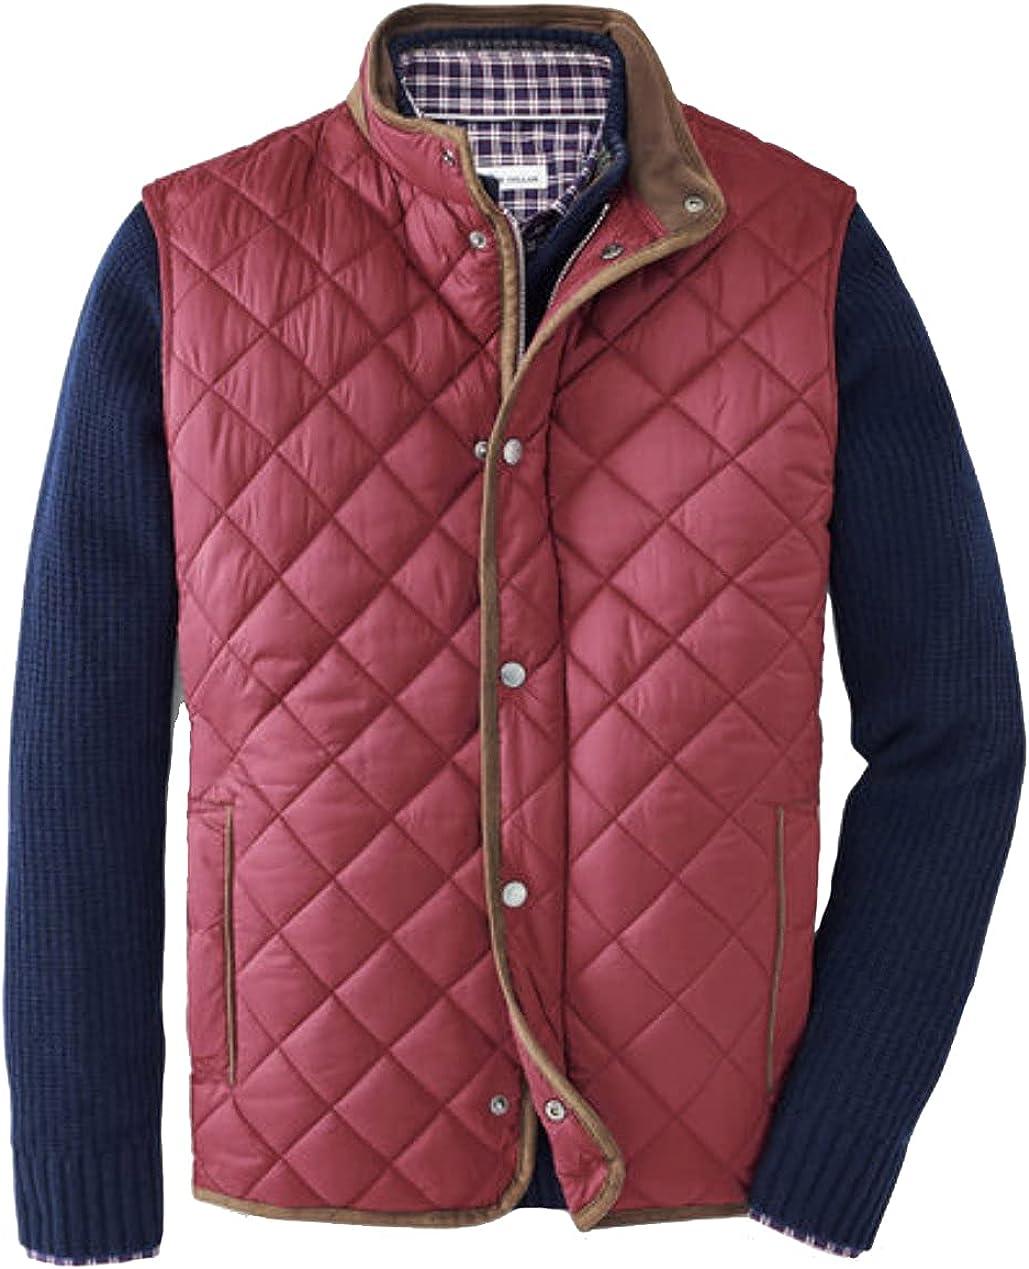 Peter Millar Men's Essex Max Max 48% OFF 40% OFF Vest Travel Quilted XXL